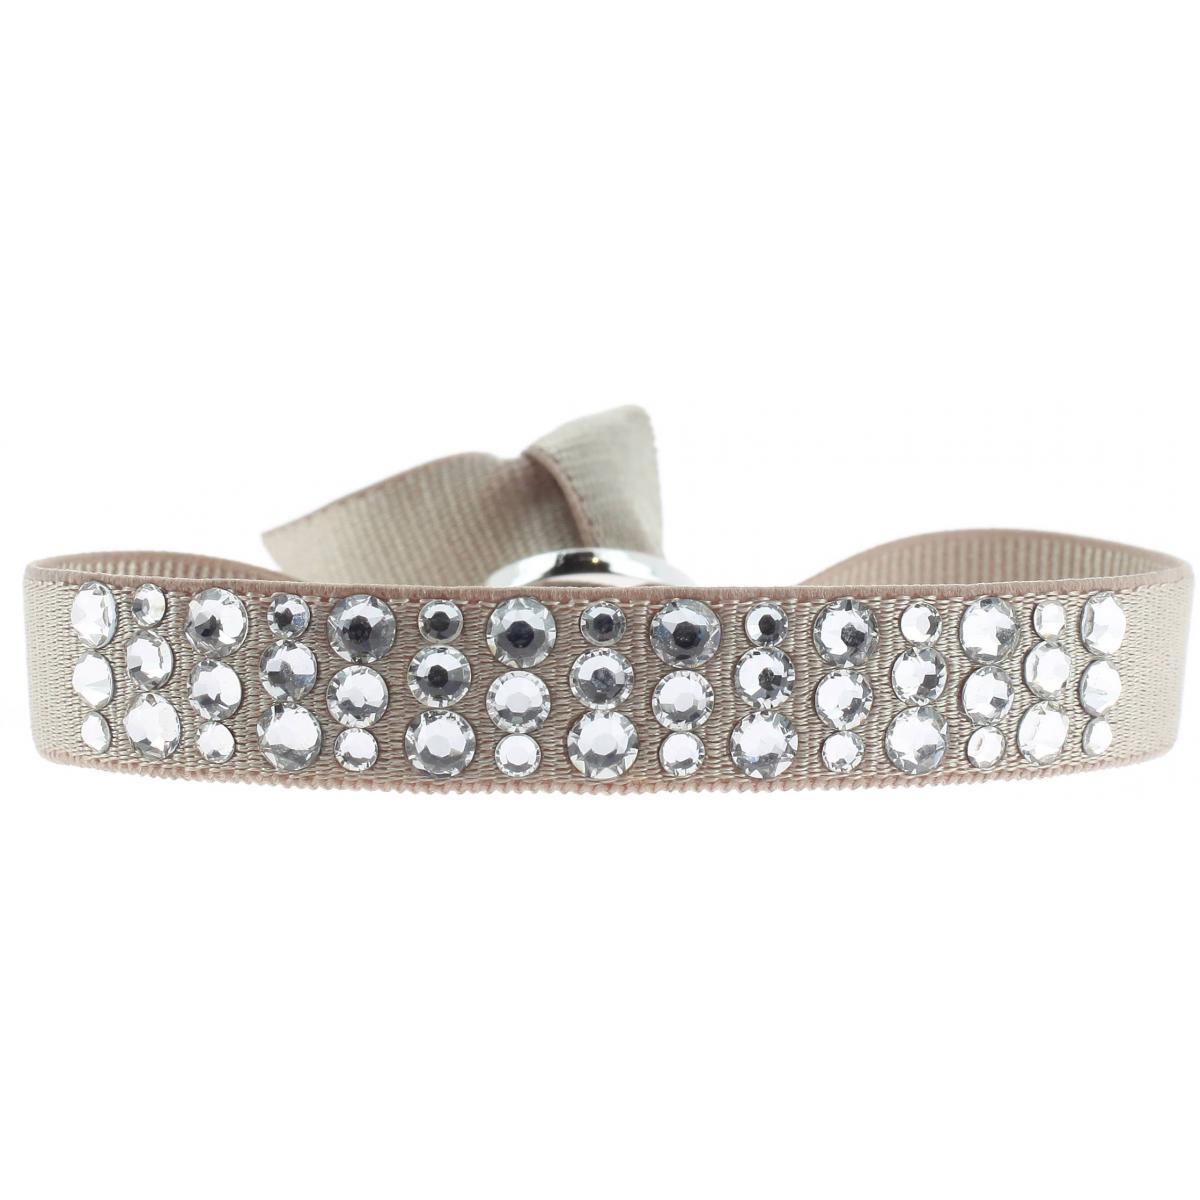 Bracelet Tissu Beige Cristaux Swarovski A32509